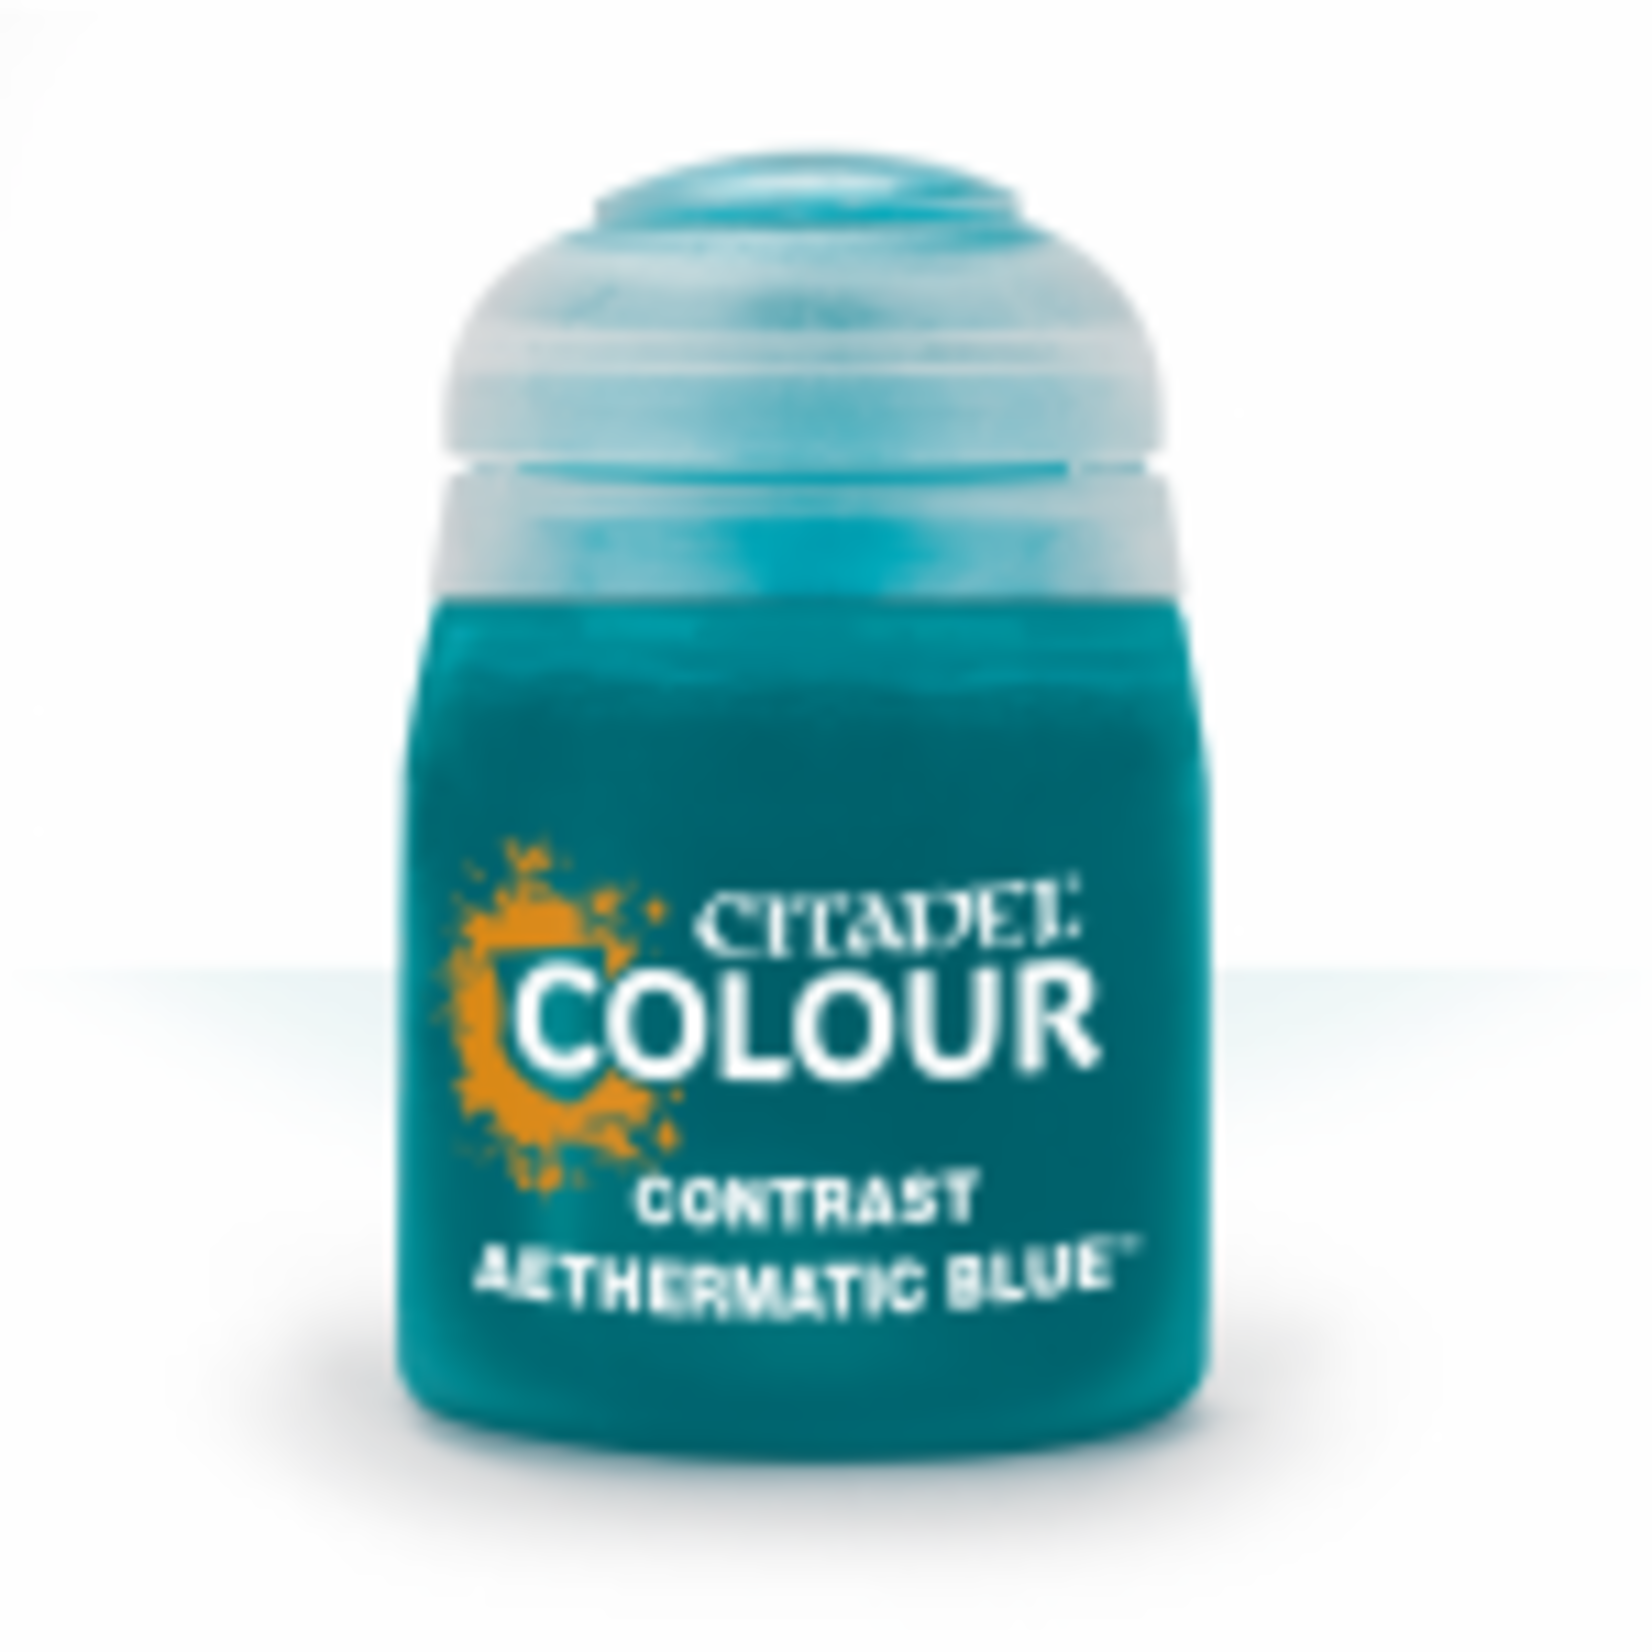 Citadel Contrast Aethermatic Blue